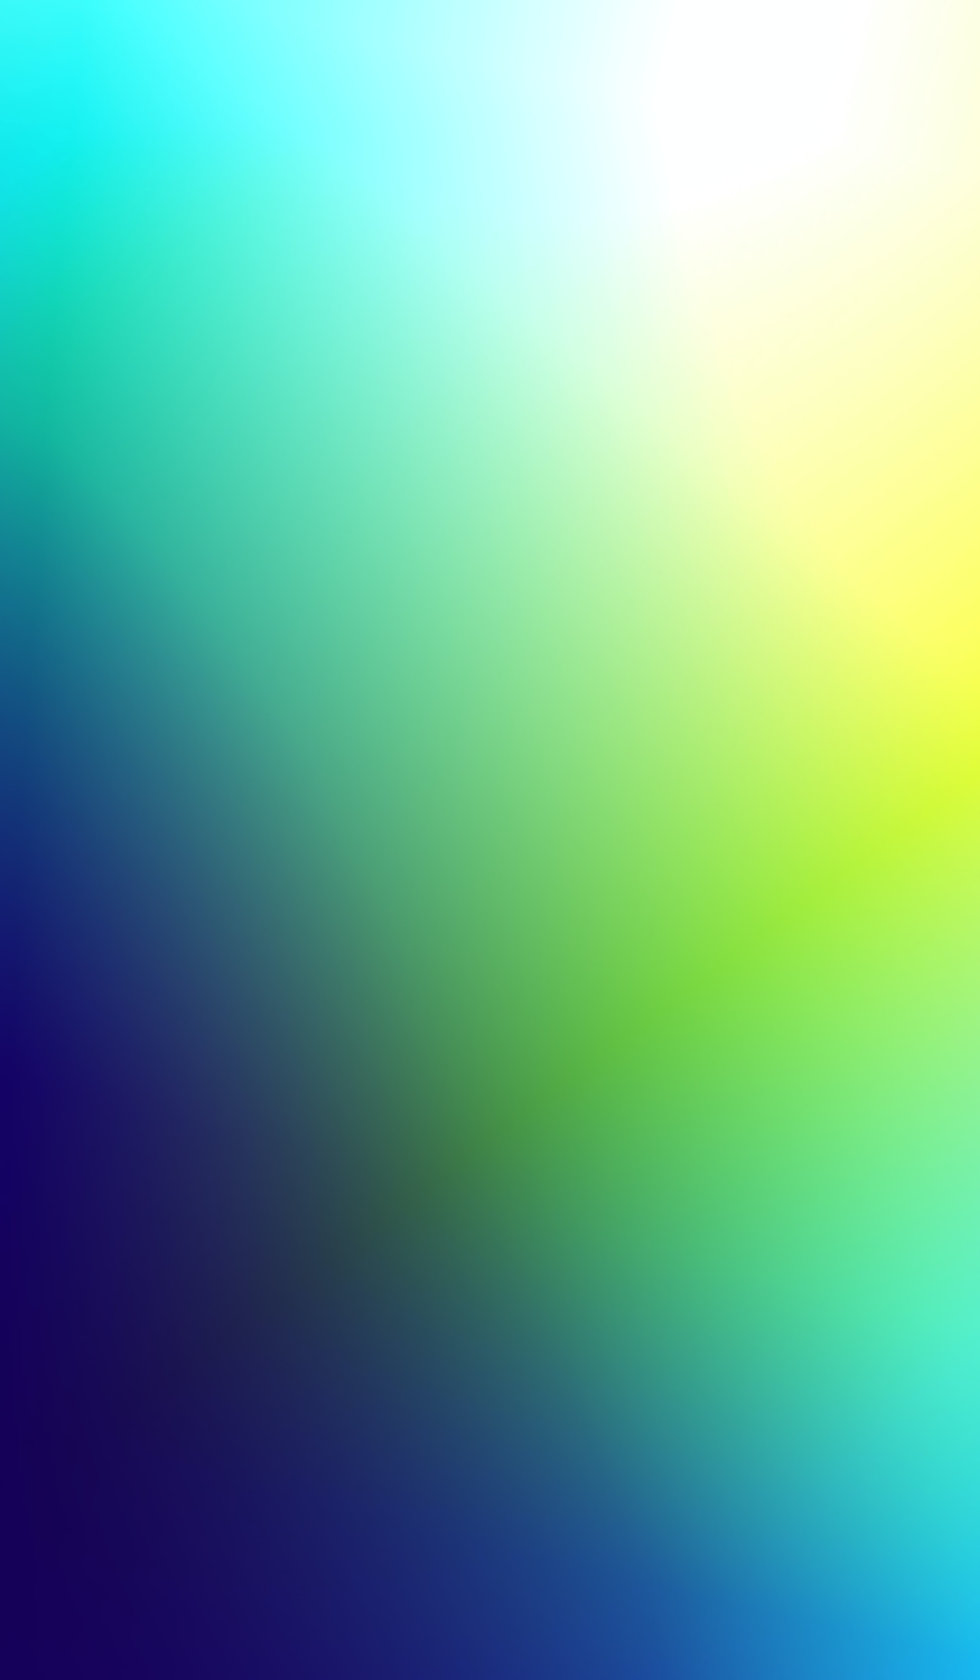 gradienta-26WixHTutxc-unsplash.jpg